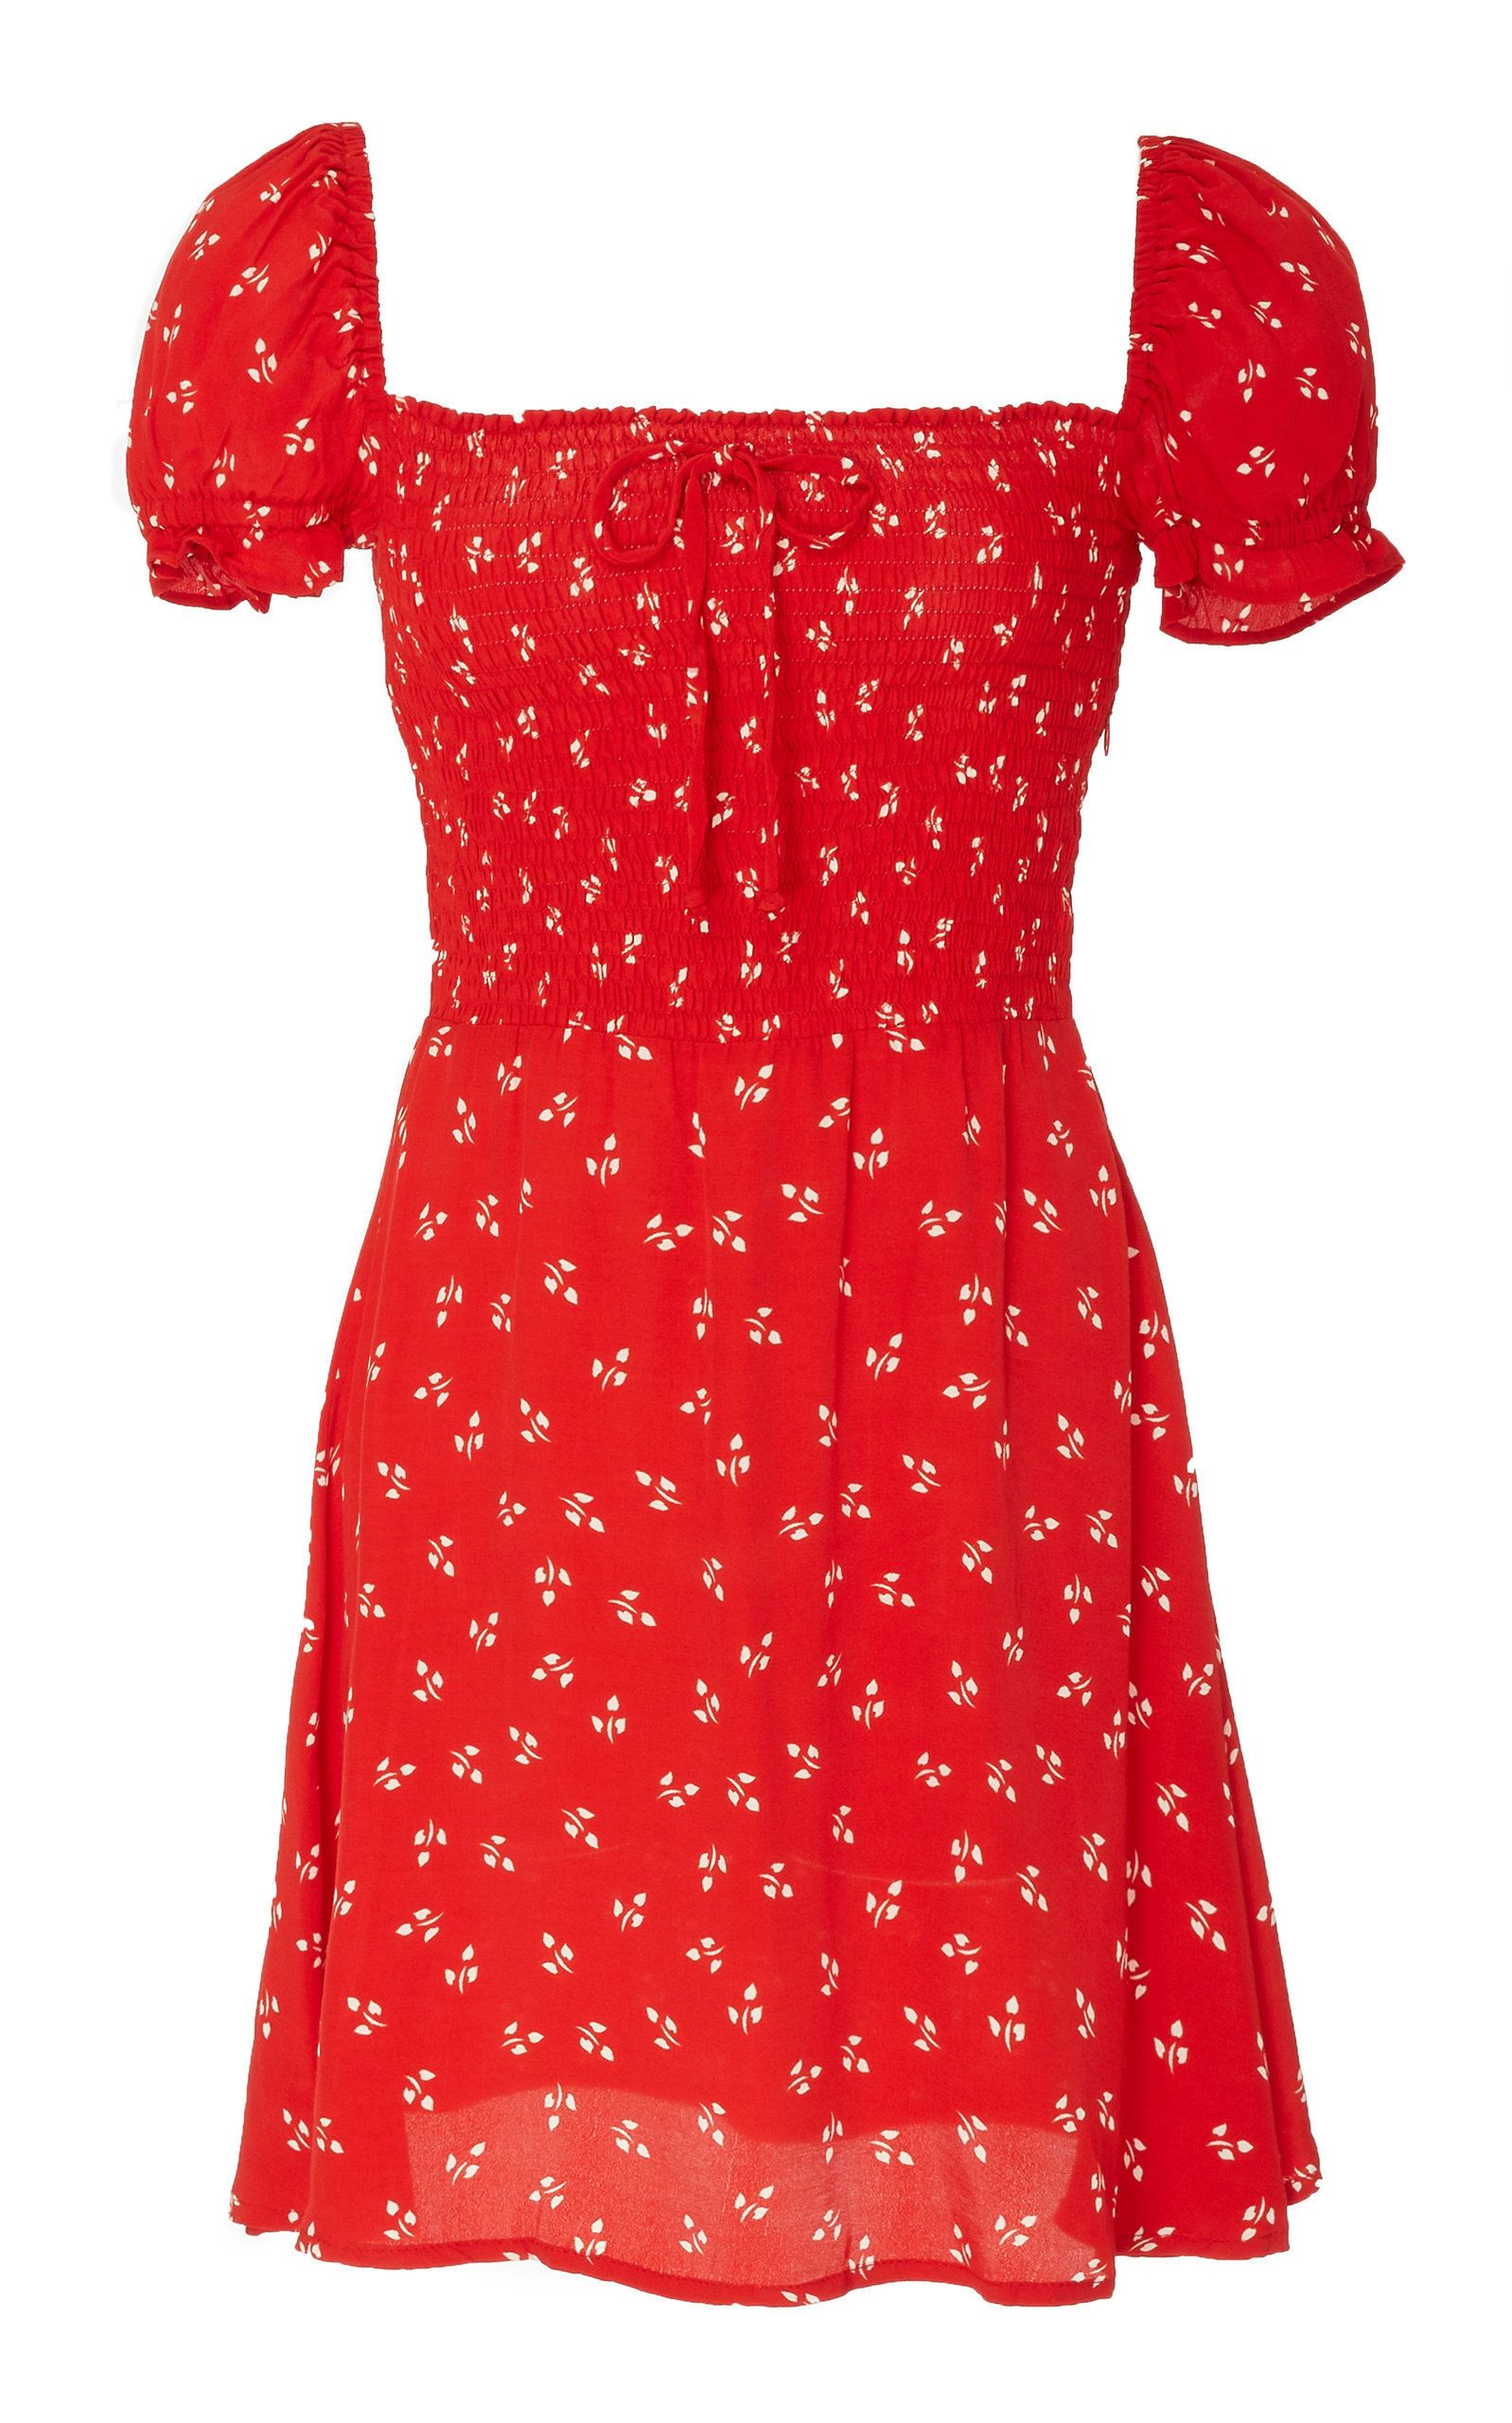 657b939ffaae Genevieve Floral-Print Chiffon Mini Dress by FAITHFULL THE BRAND Now  Available on Moda Operandi